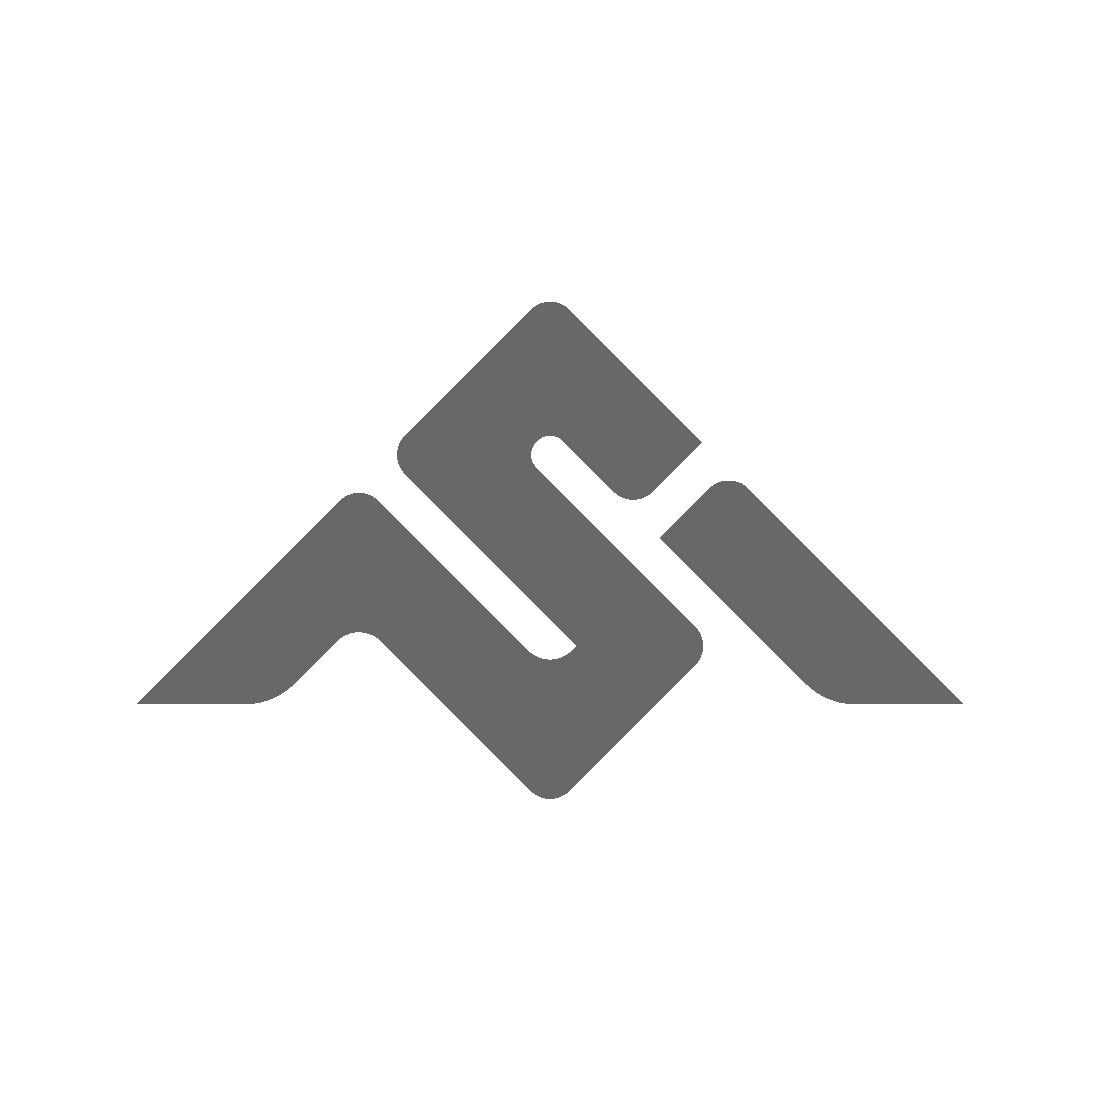 rollen mit grossen r dern smarscoo 200 smartscoo kaufen scooter online sportmania. Black Bedroom Furniture Sets. Home Design Ideas